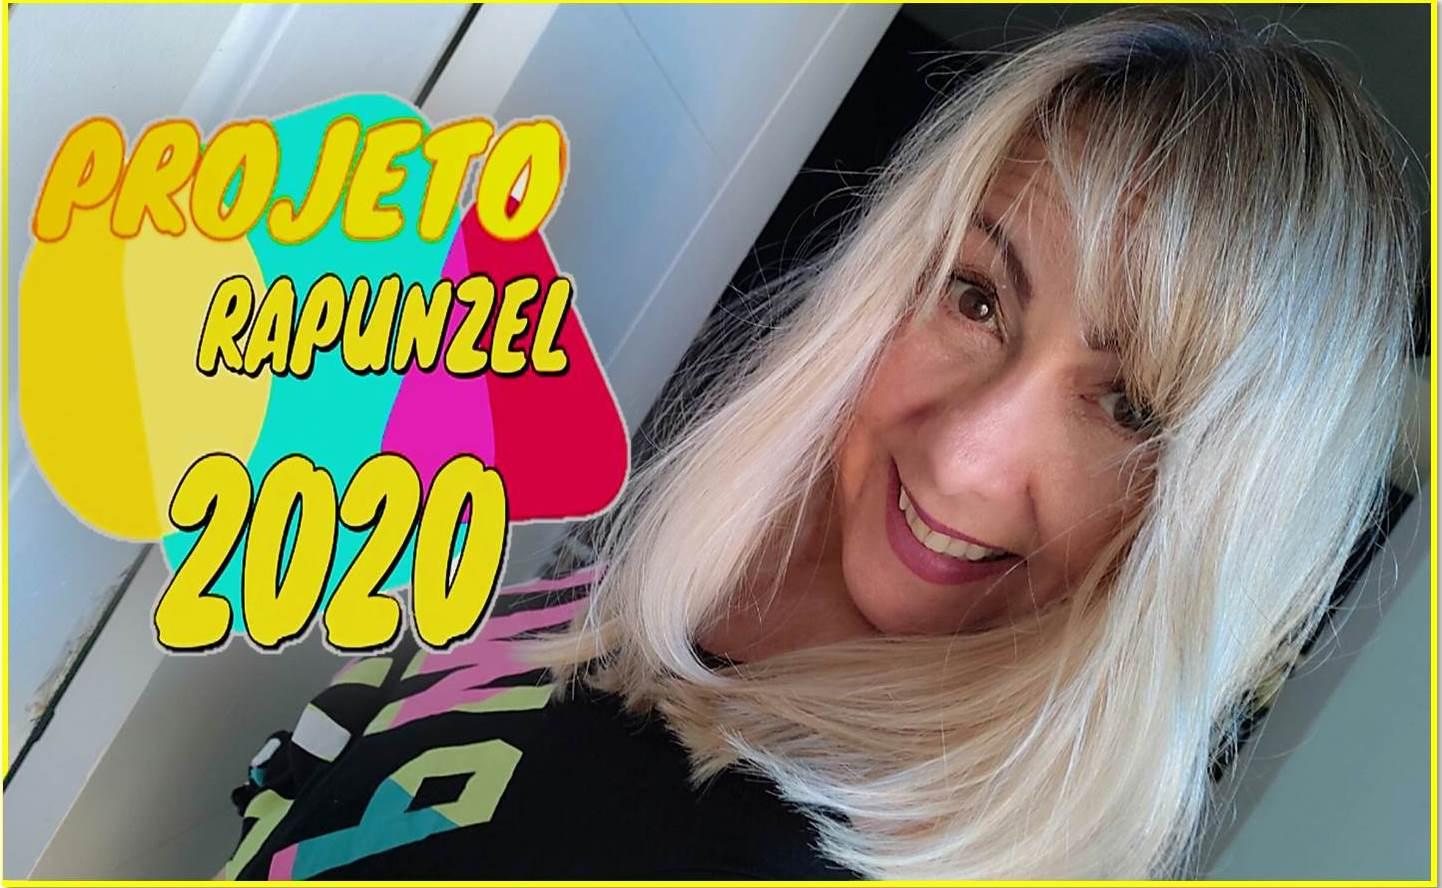 PROJETO RAPUNZEL 2020-VEM CABELÃO!